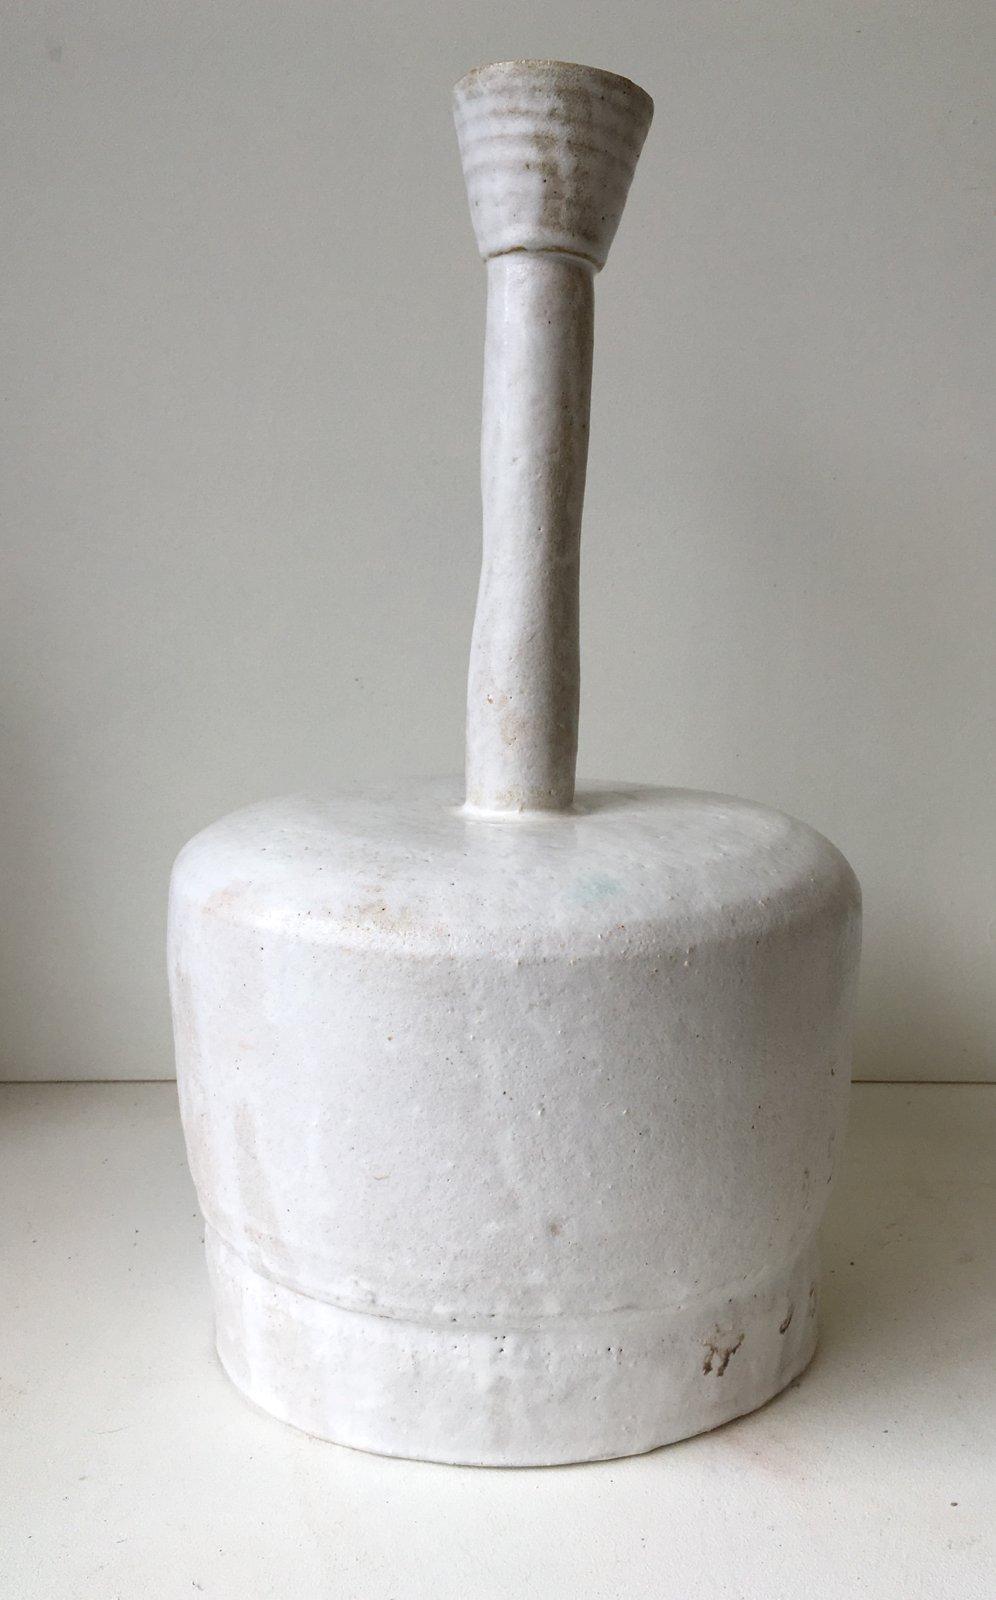 Image of Large White Bottle with Long Neck